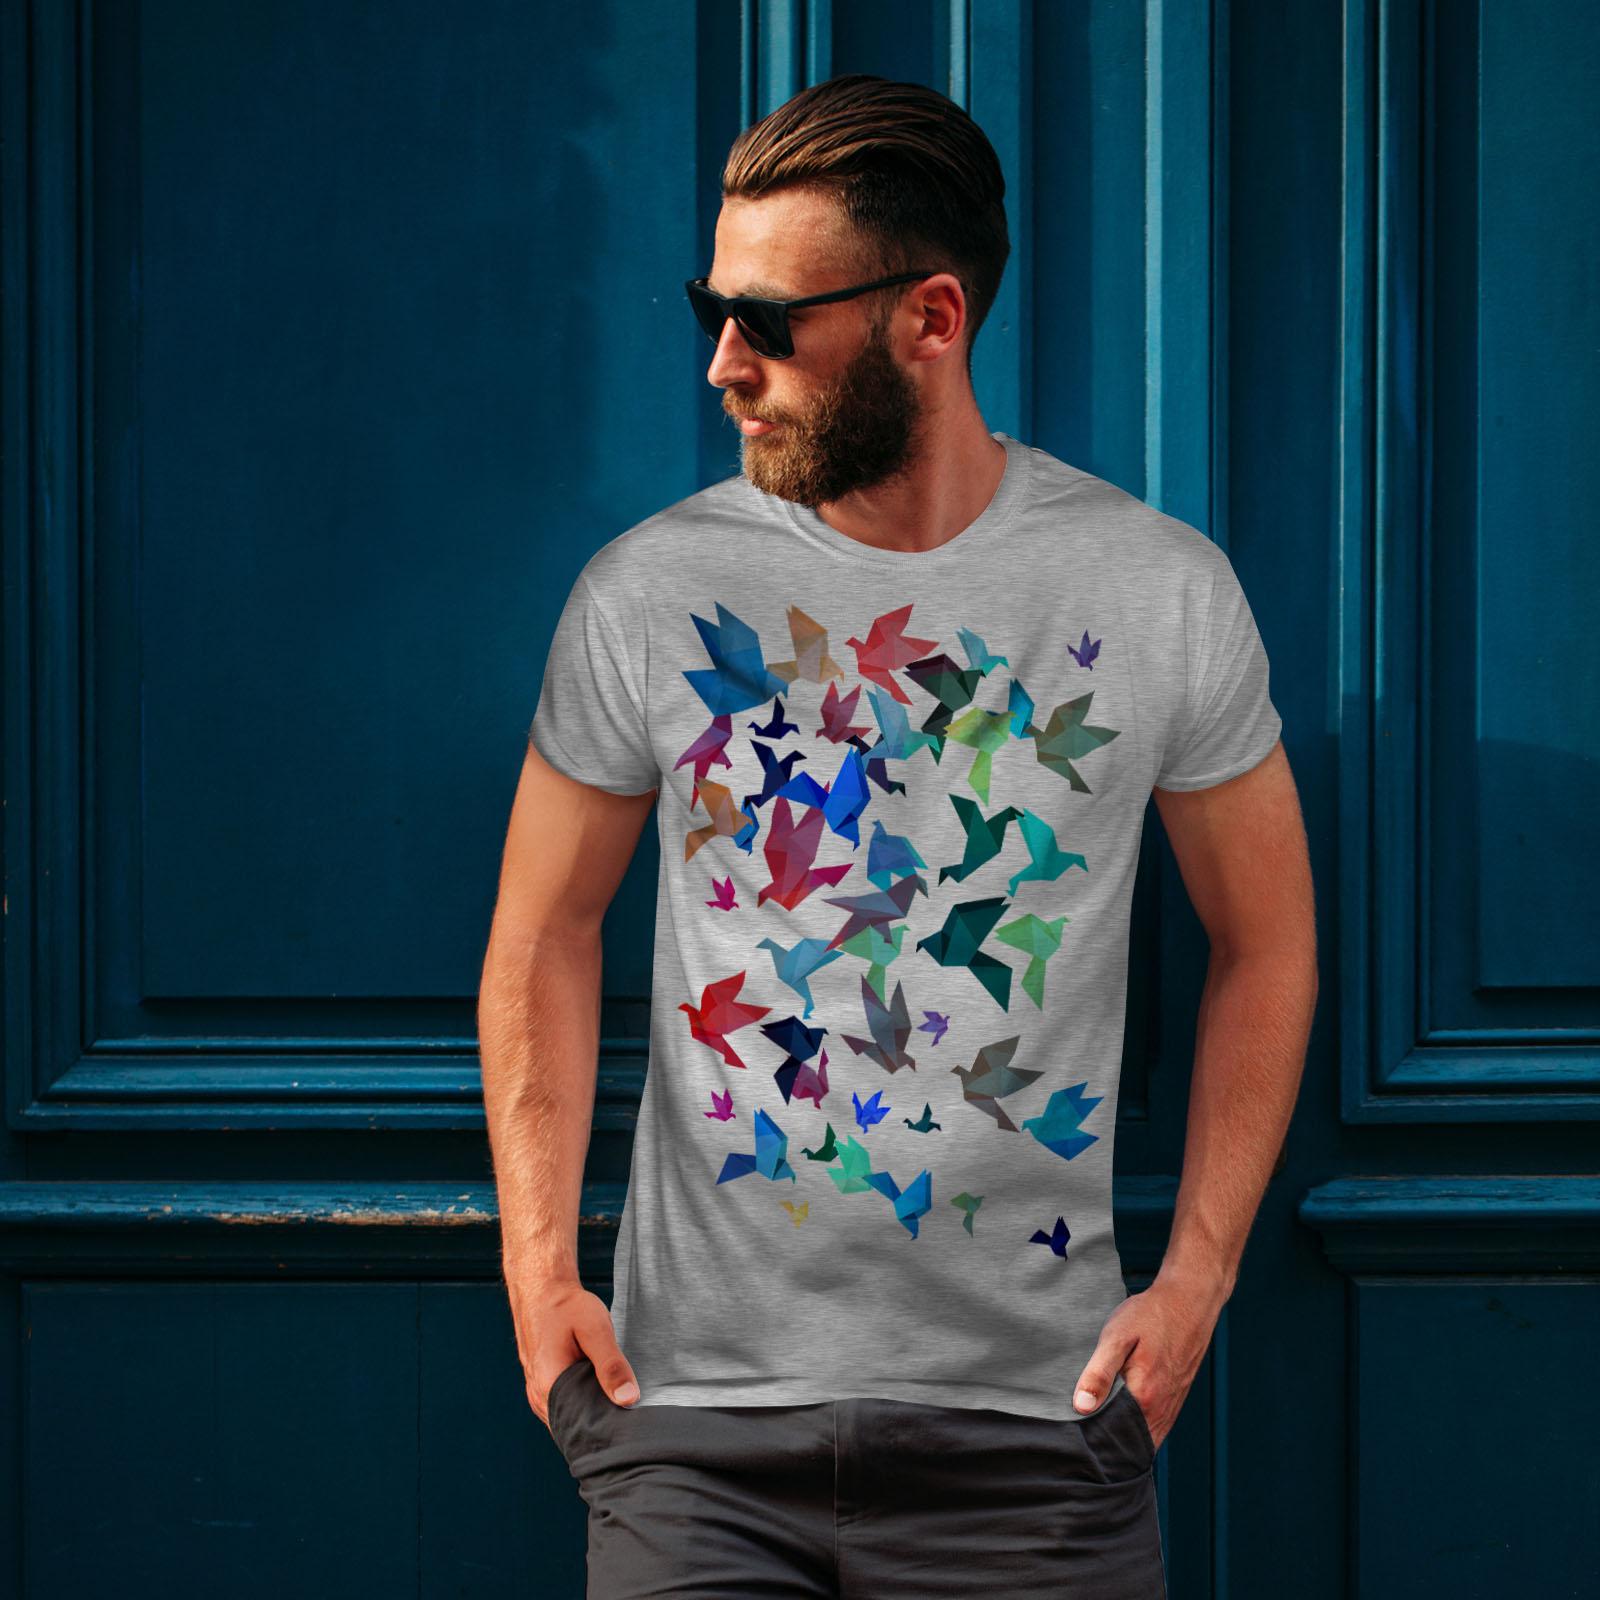 Wellcoda-Origami-Bird-Colors-Mens-T-shirt-Craft-Graphic-Design-Printed-Tee thumbnail 16